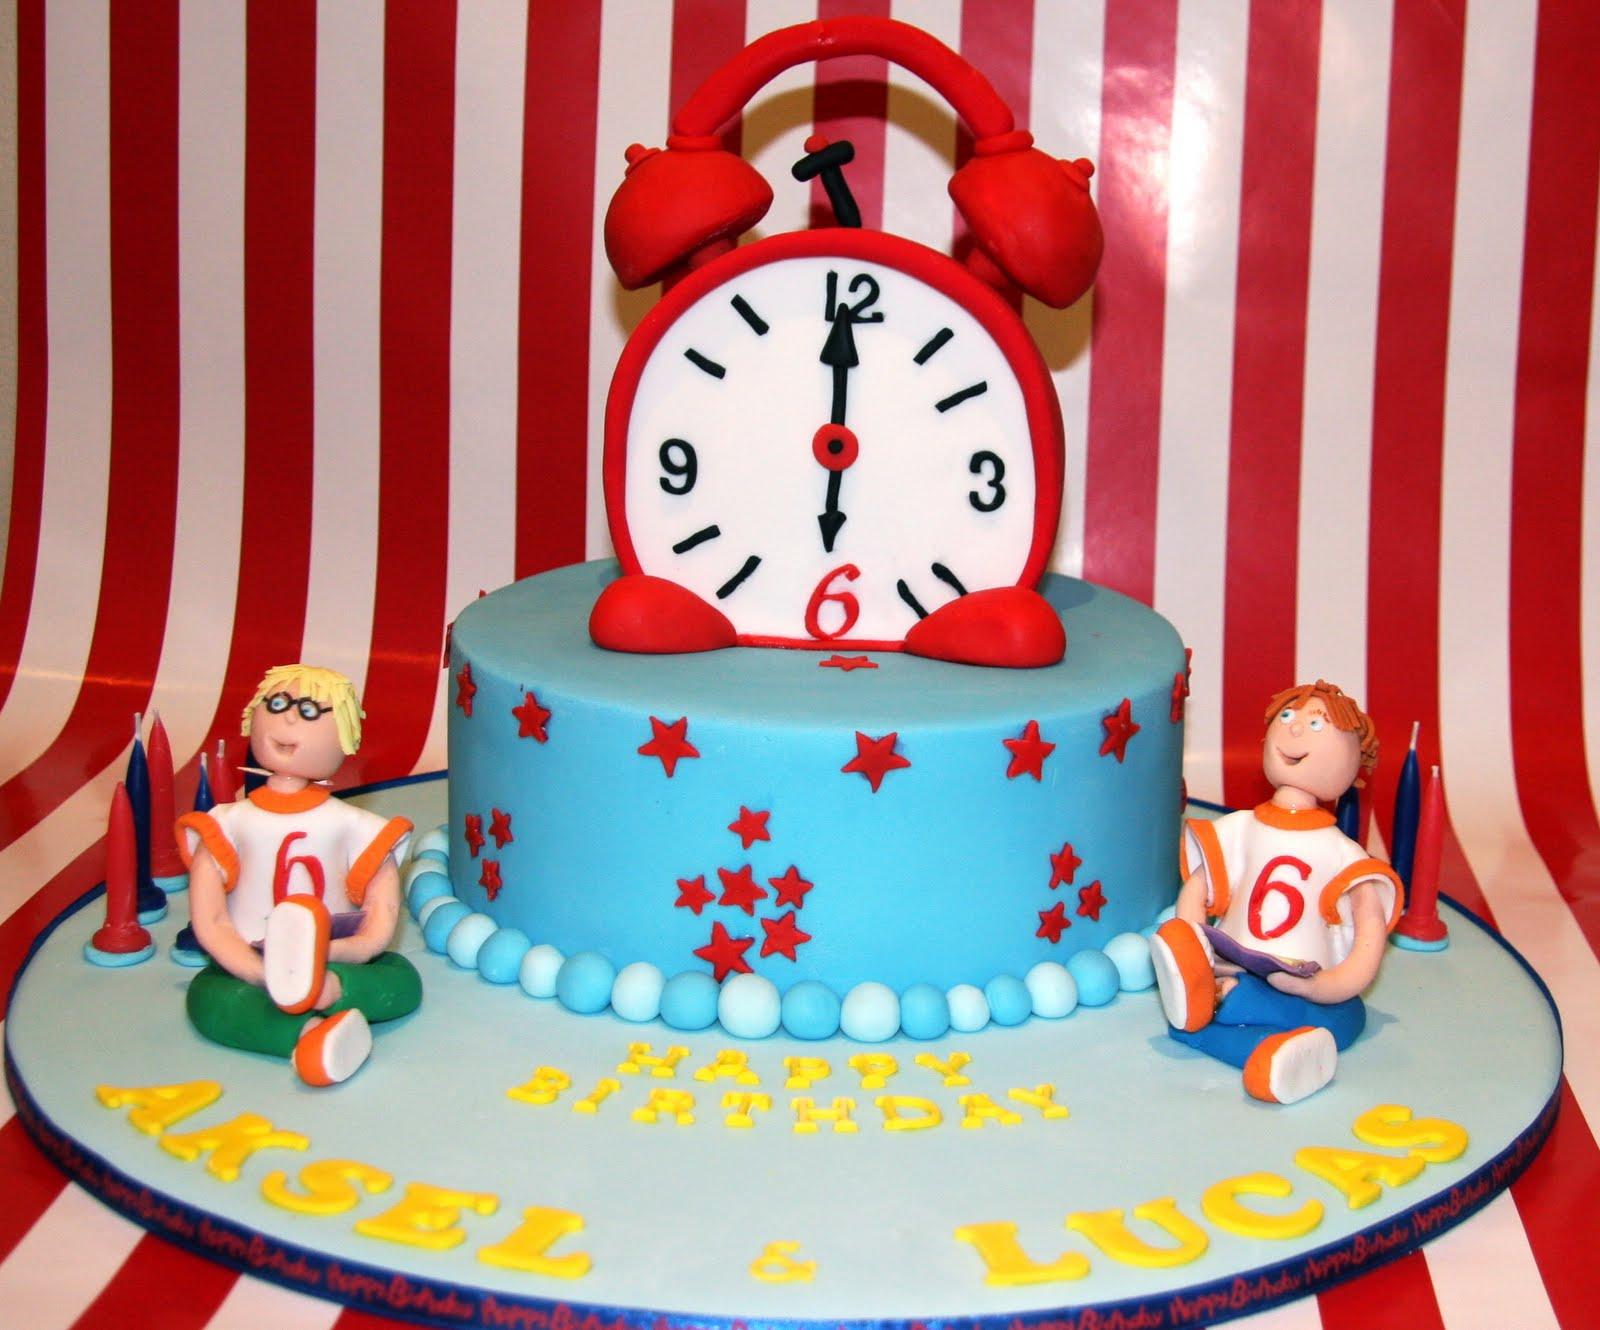 The Cupcake Fairy: CLOCK CAKE